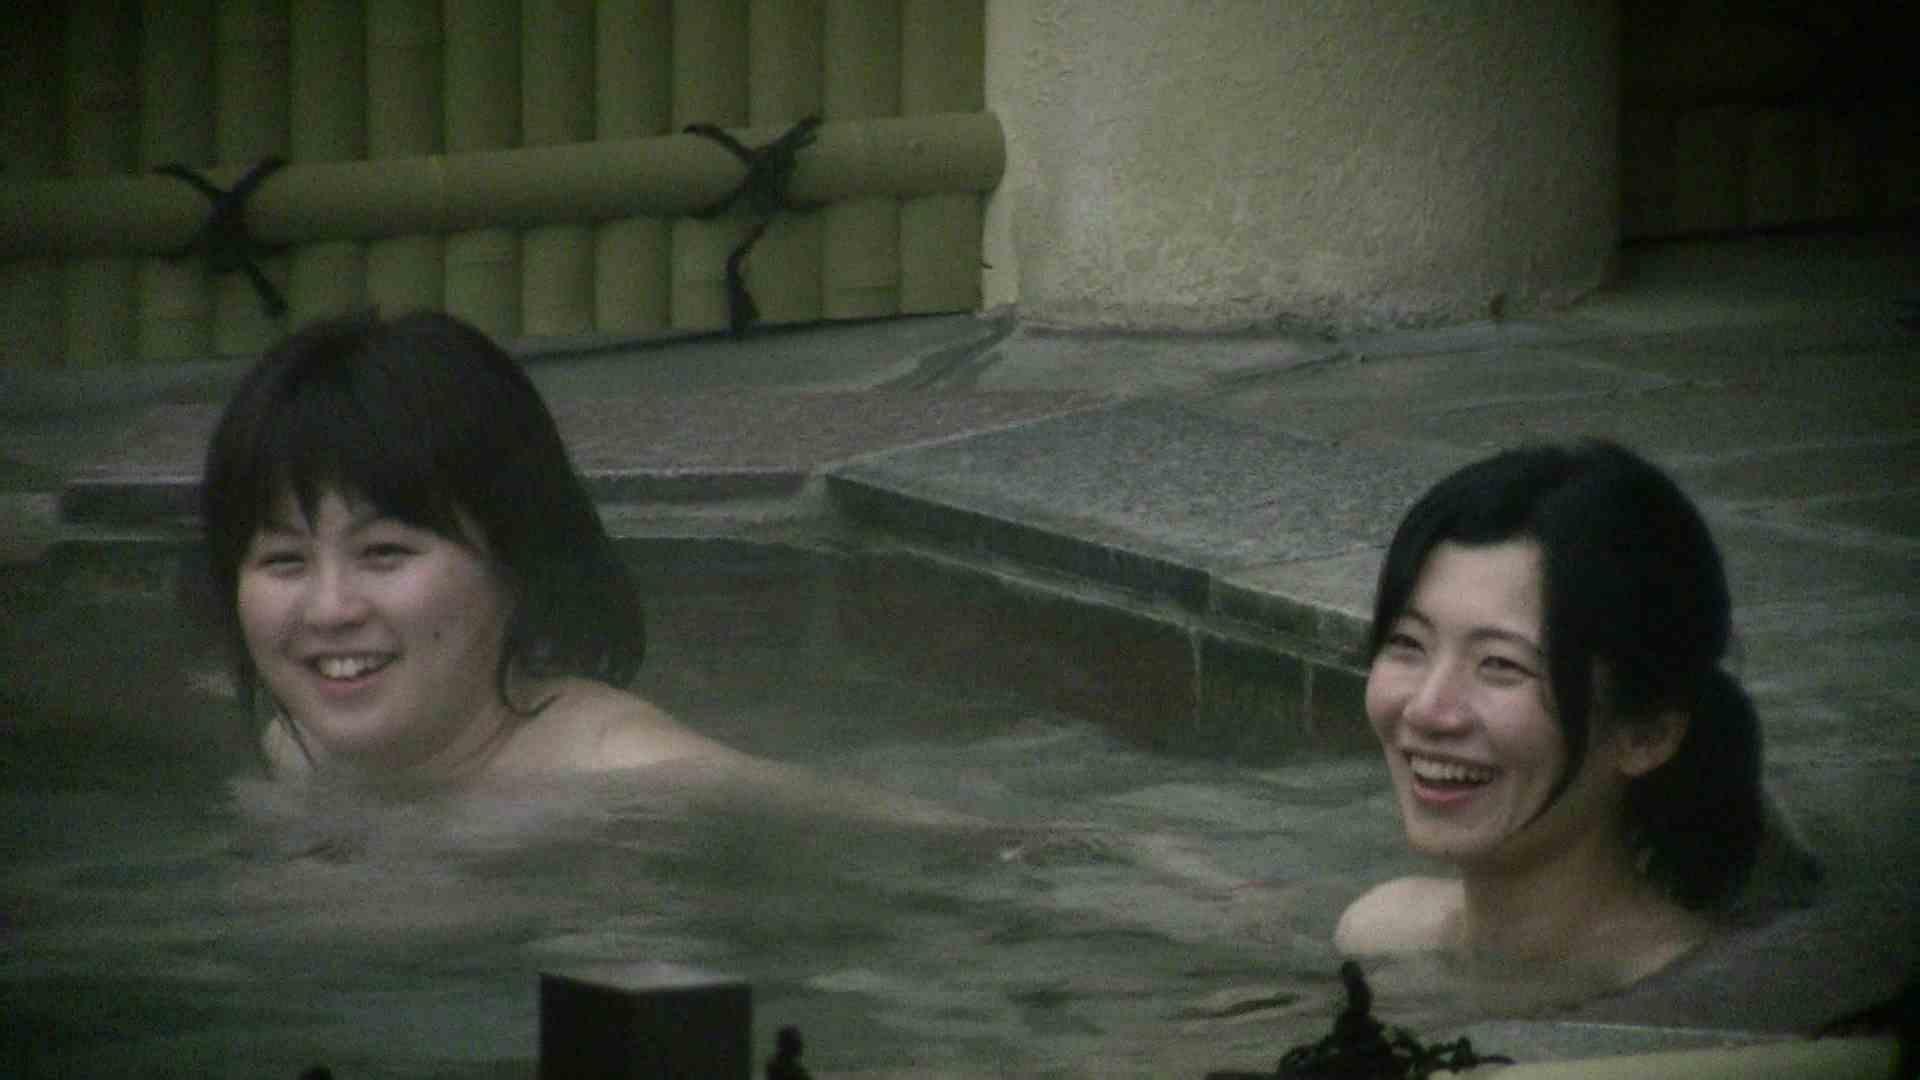 Aquaな露天風呂Vol.539 盗撮  62pic 19